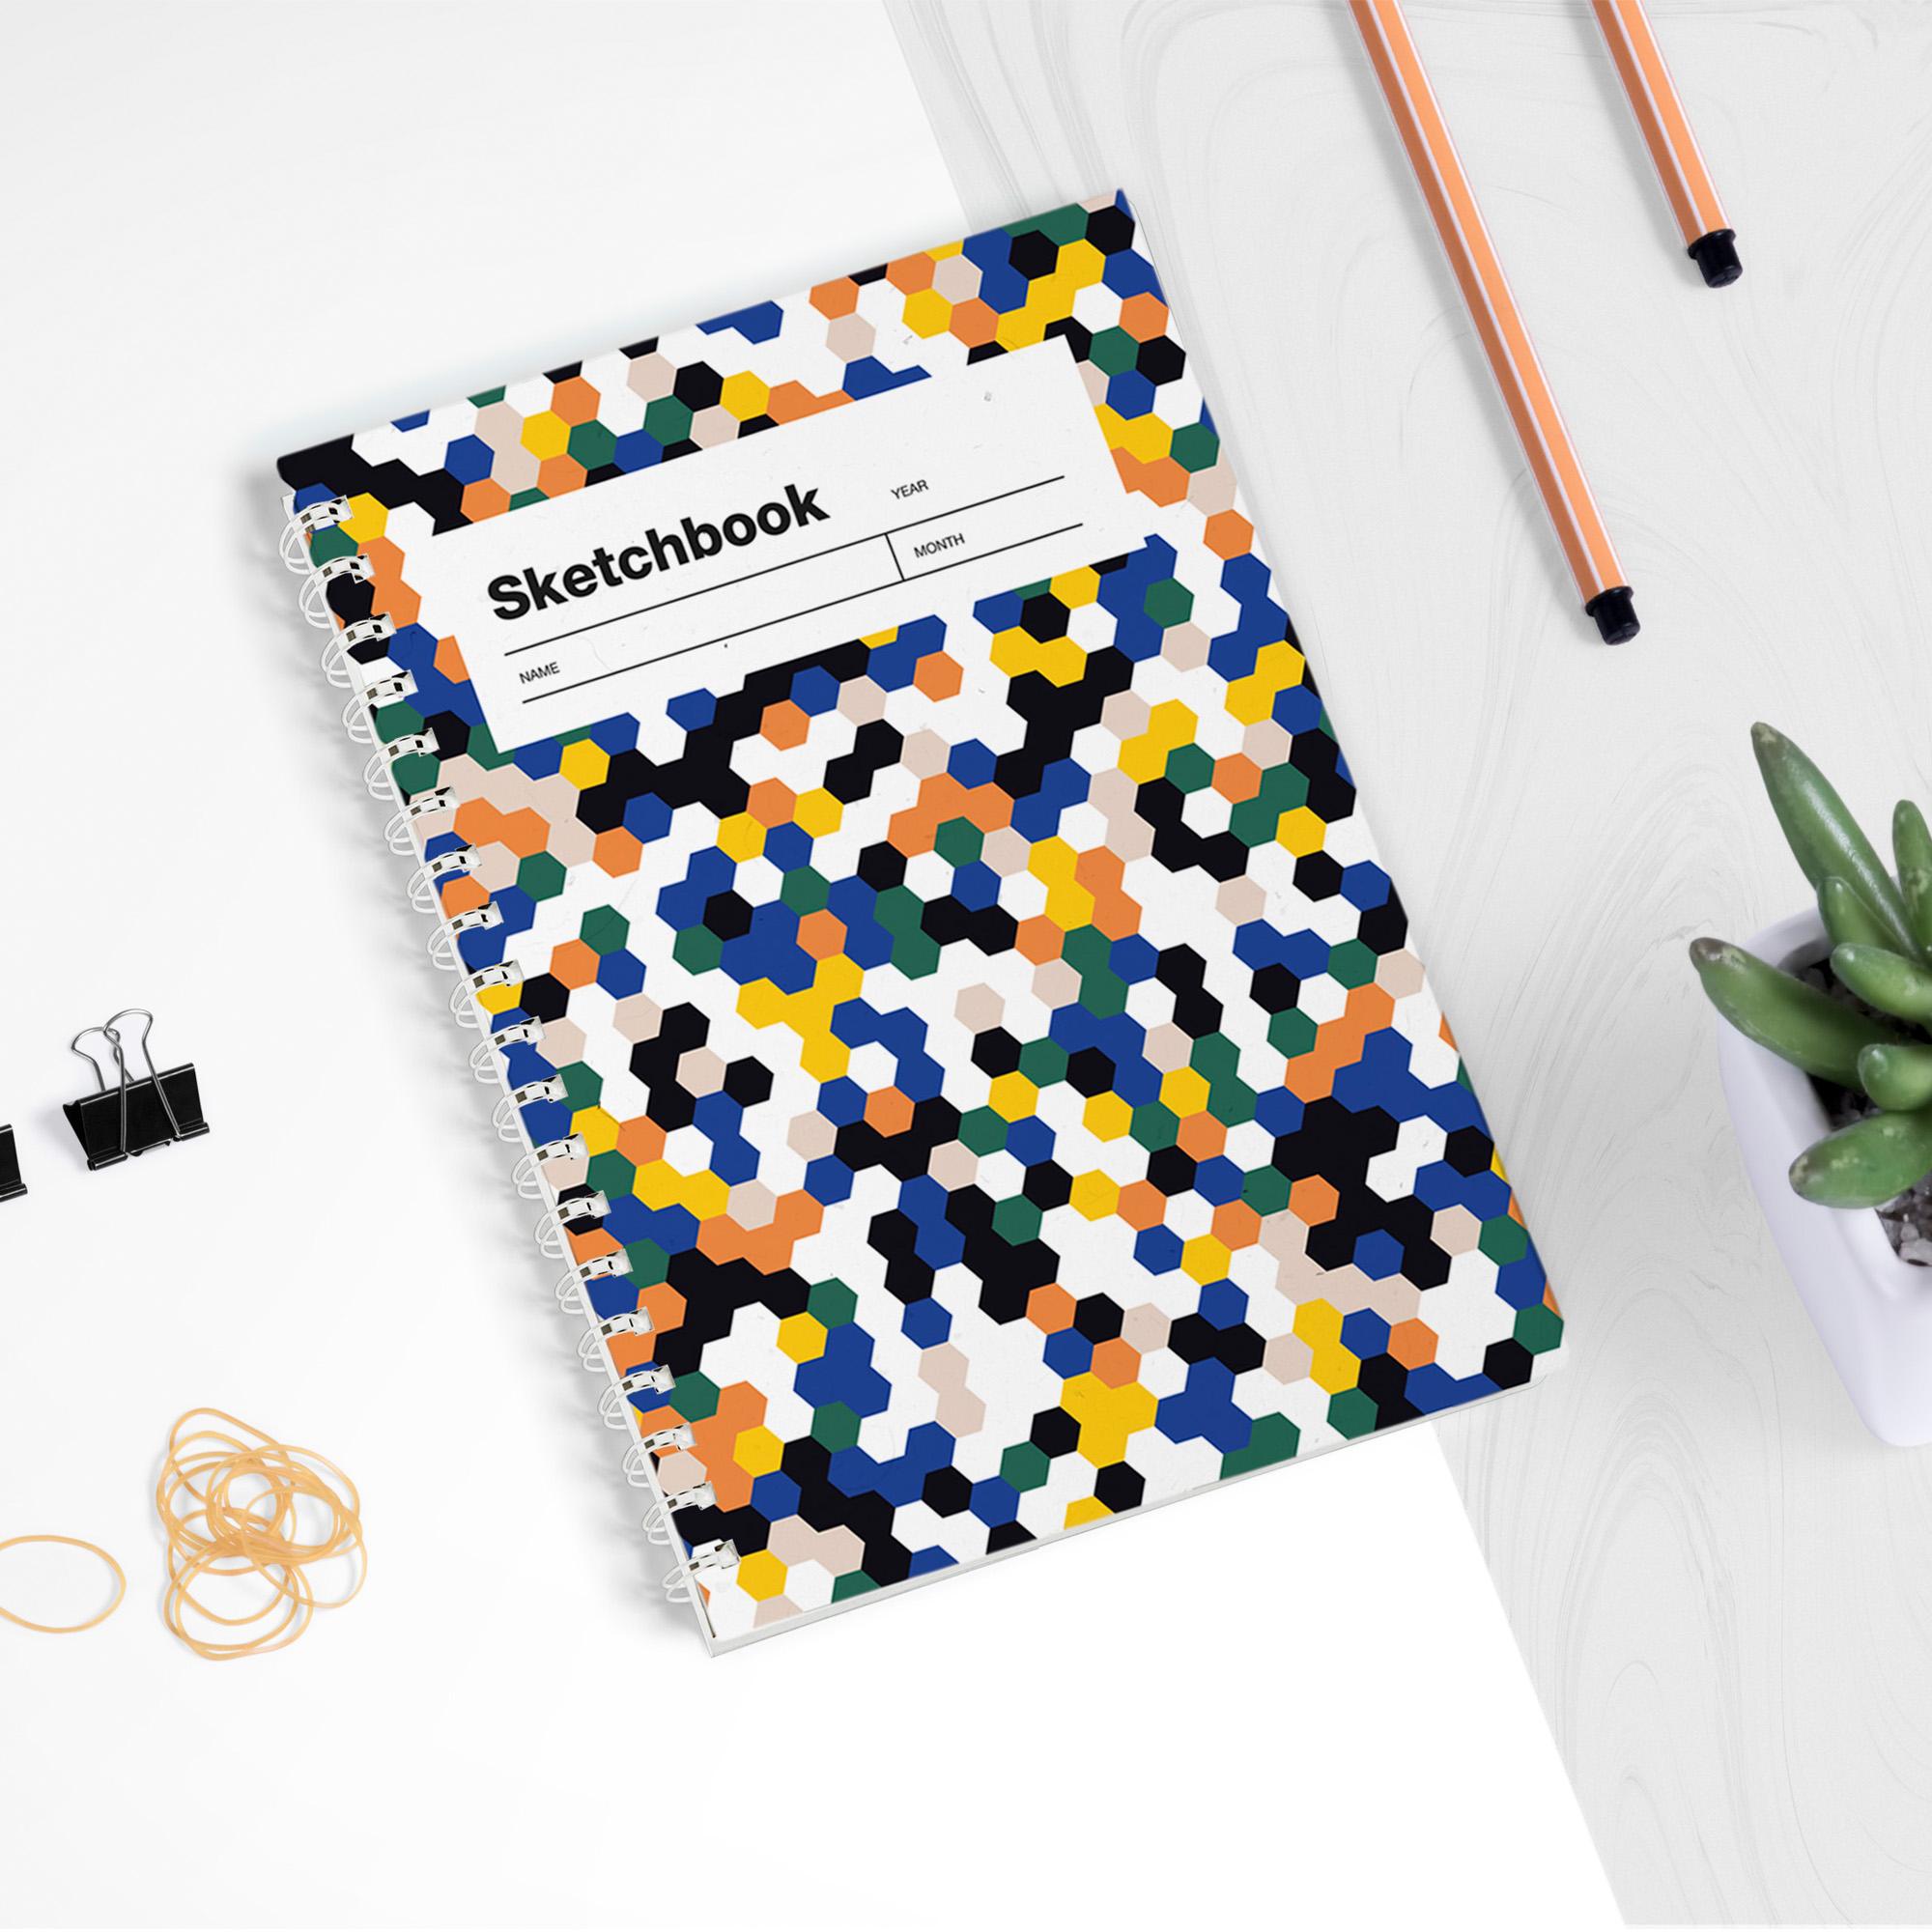 A5 Sketchbook by WEEW Smart Design